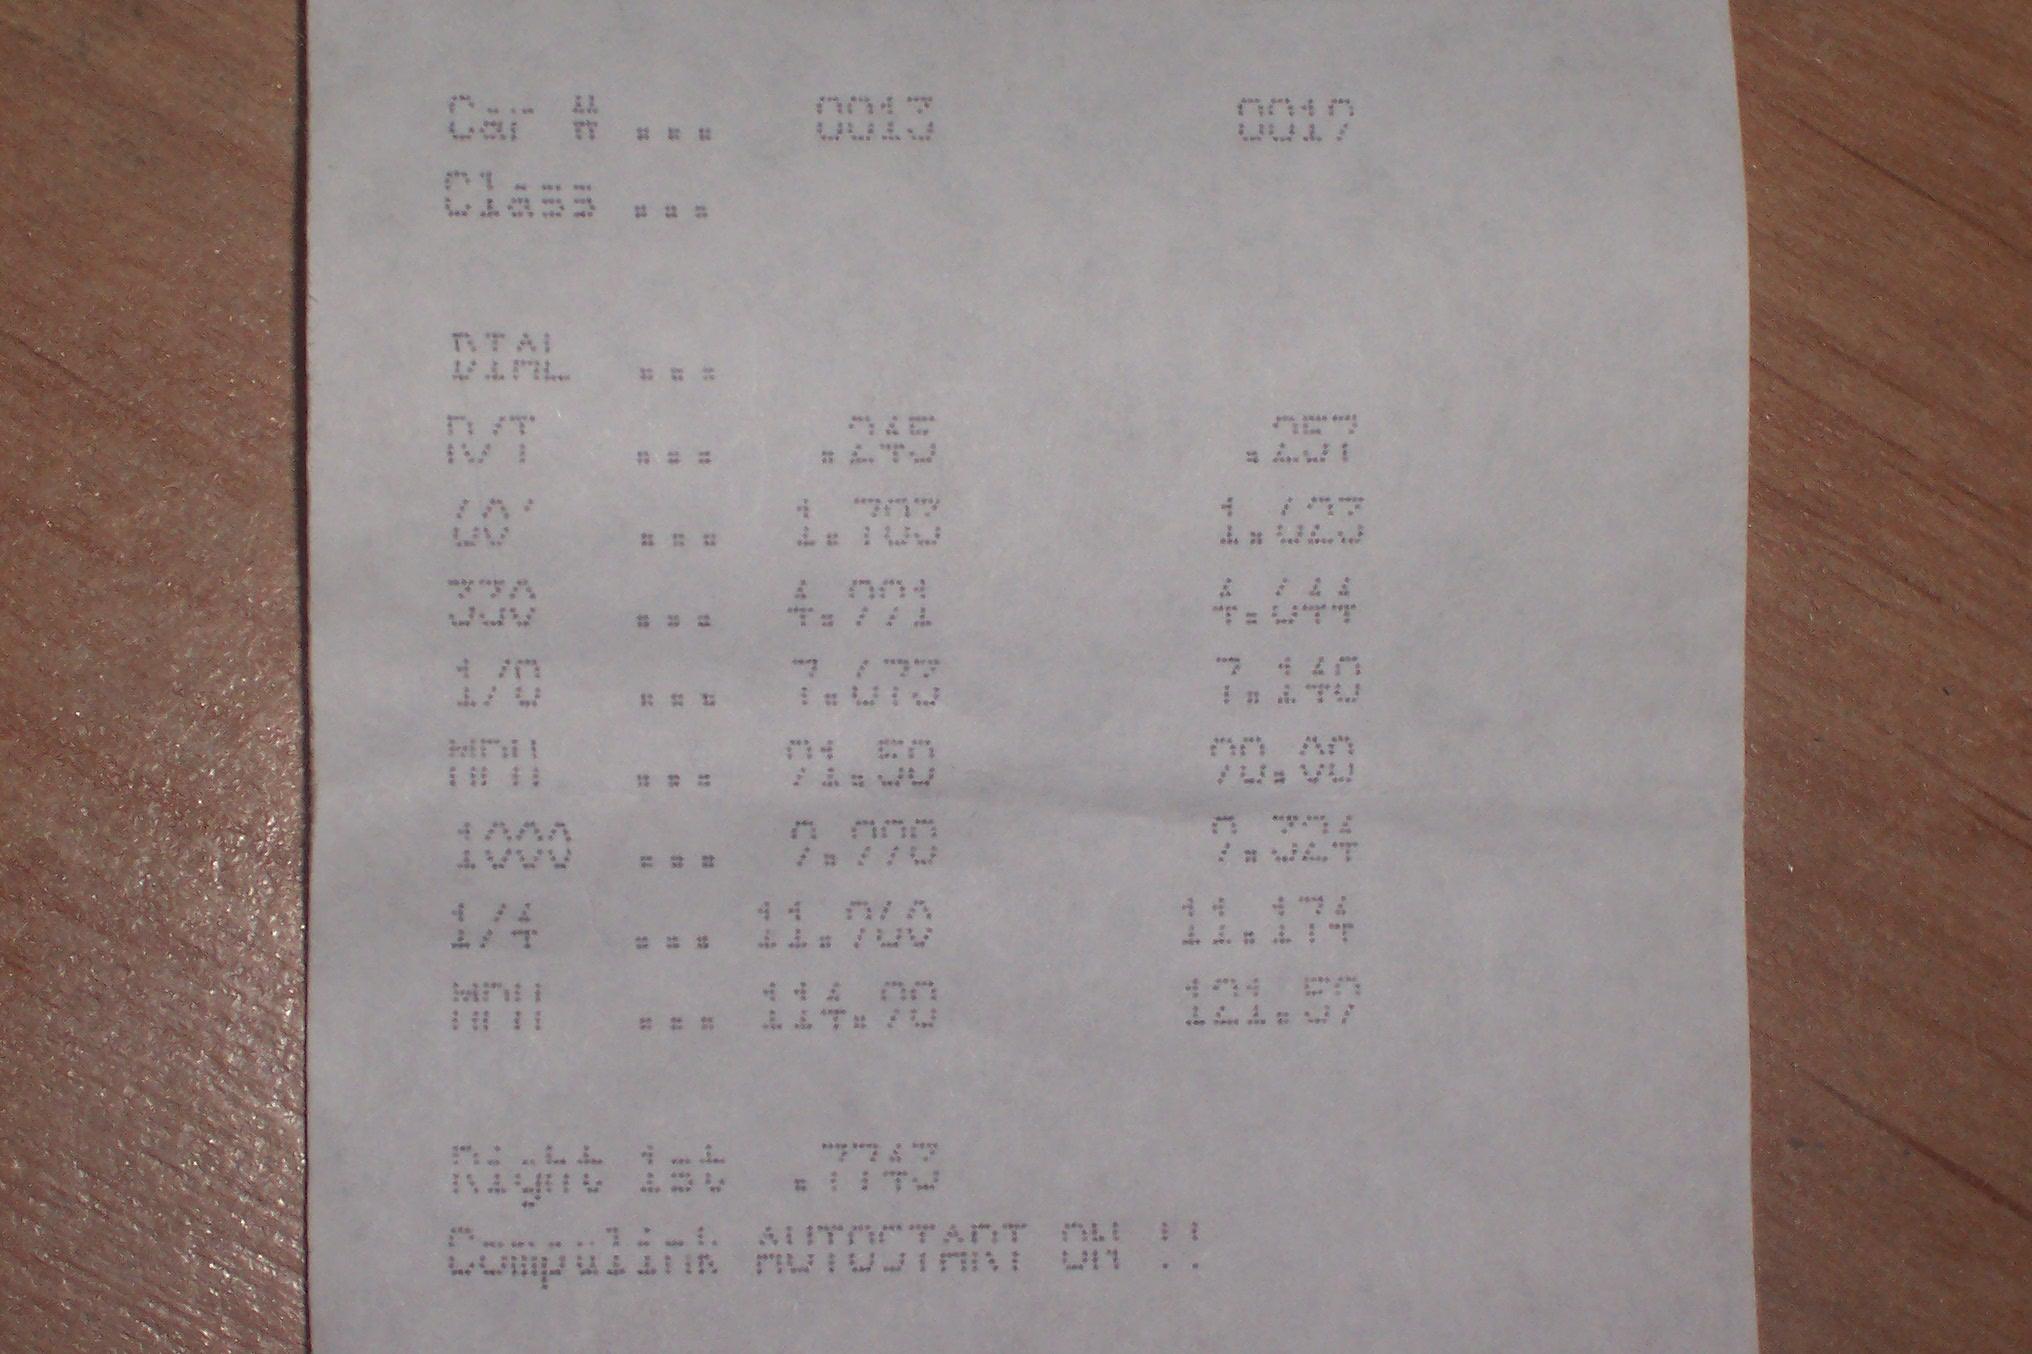 Mercury Cougar Timeslip Scan